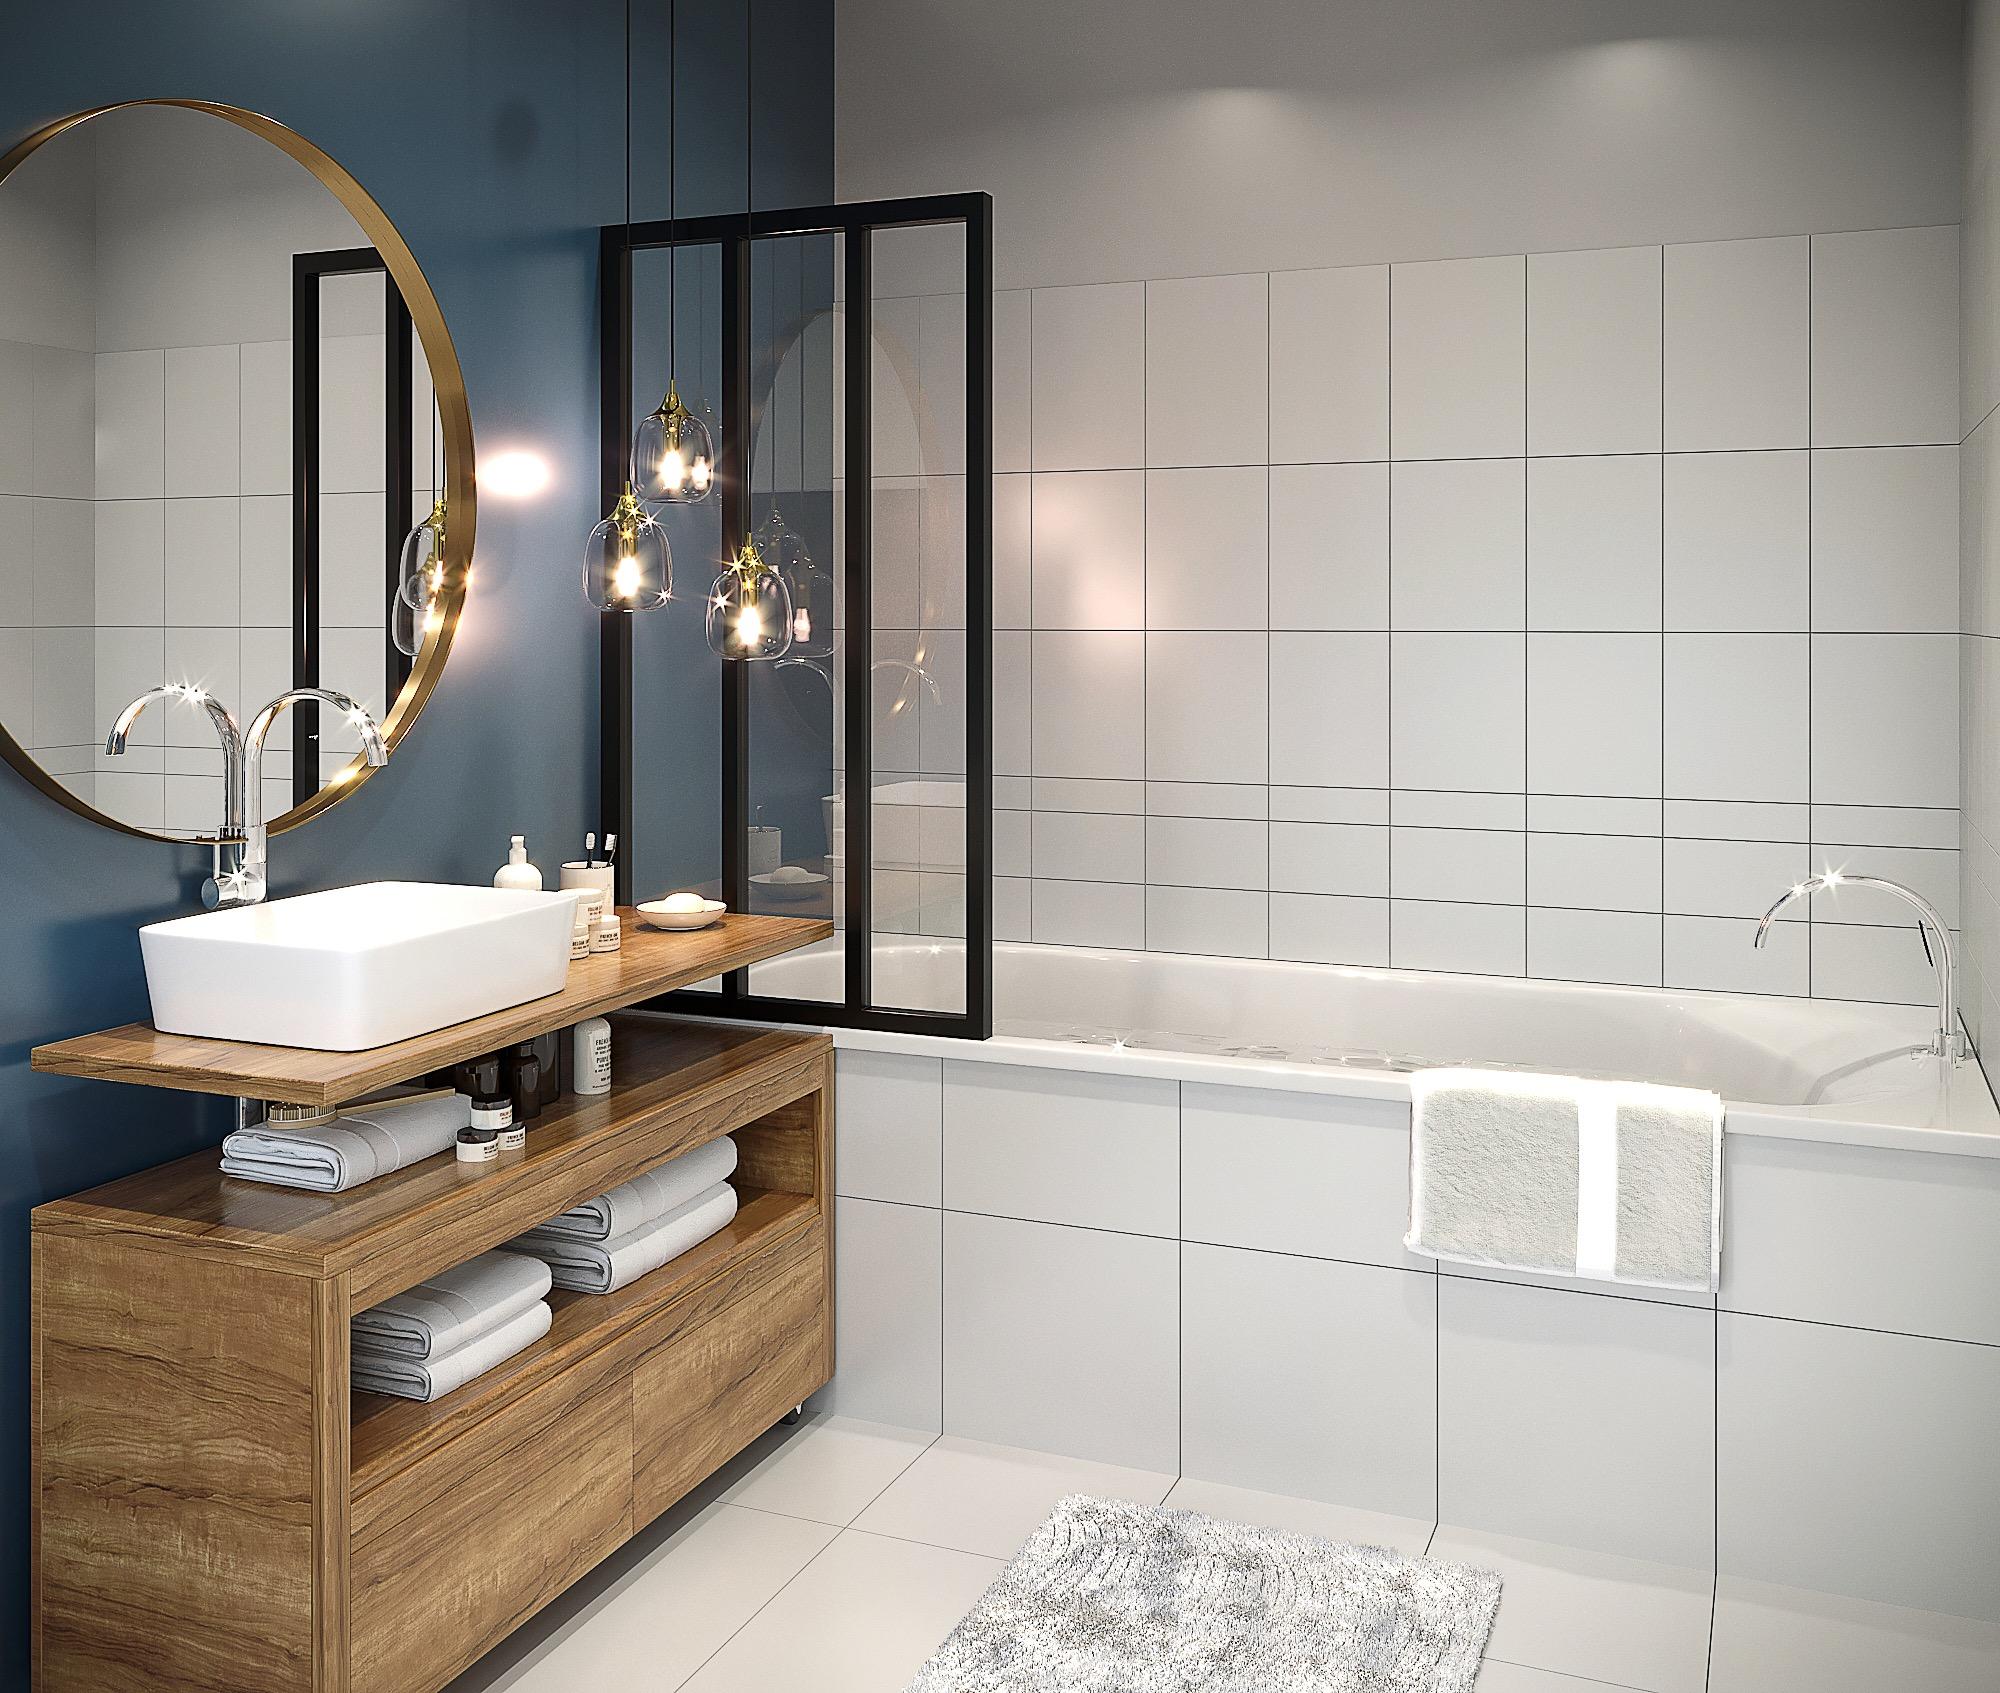 Moderniser Salle De Bain comment relooker une salle de bains ? - madame figaro